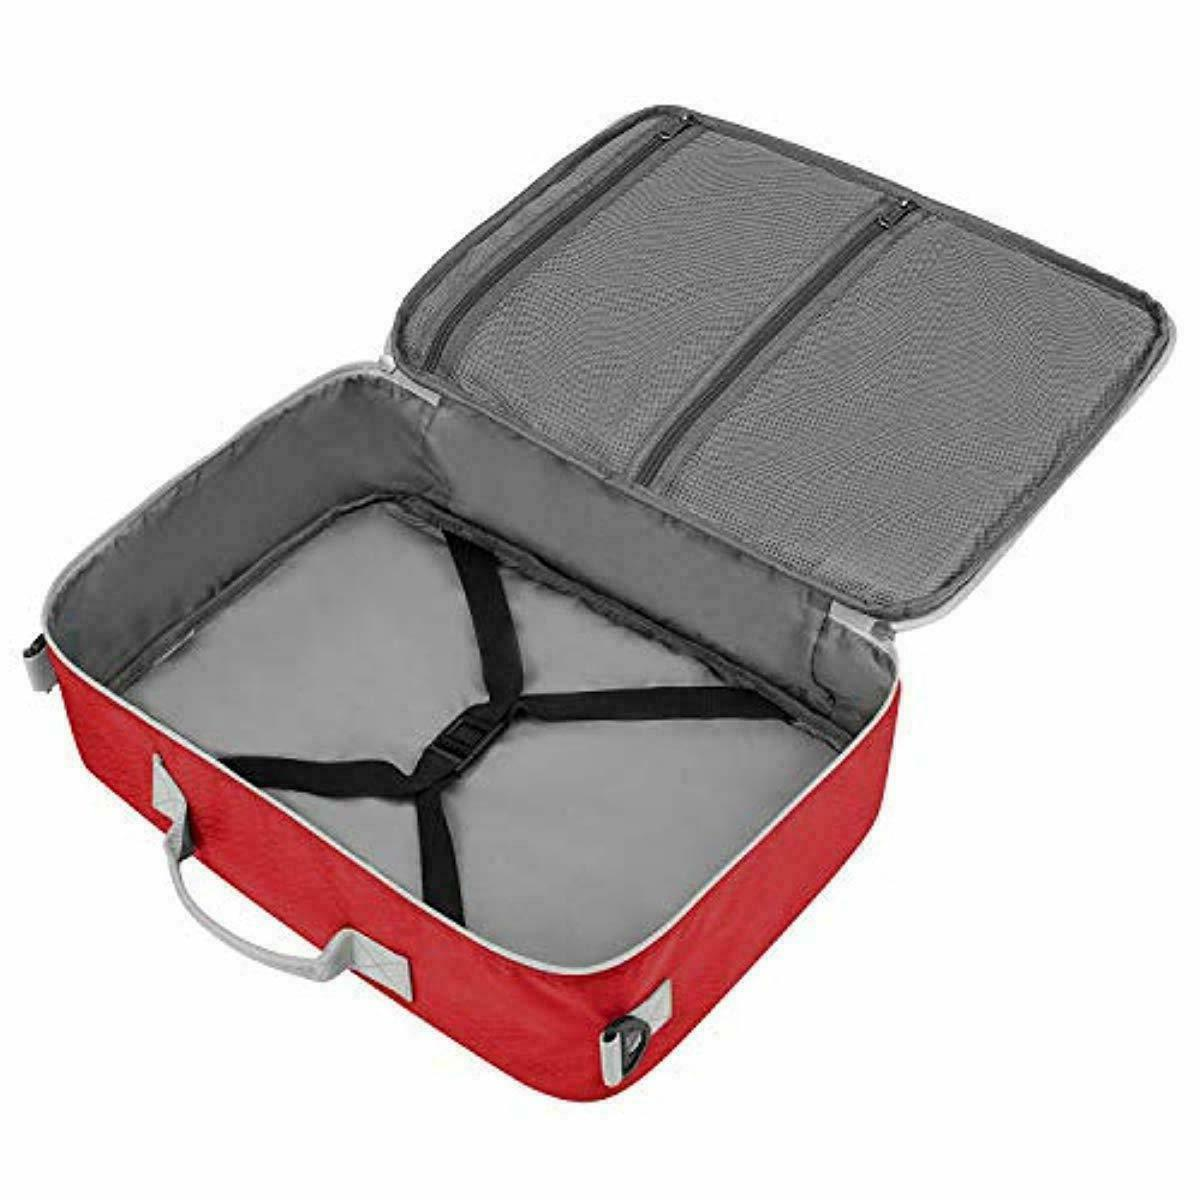 Gonex Bag 20L Portable Luggage - or